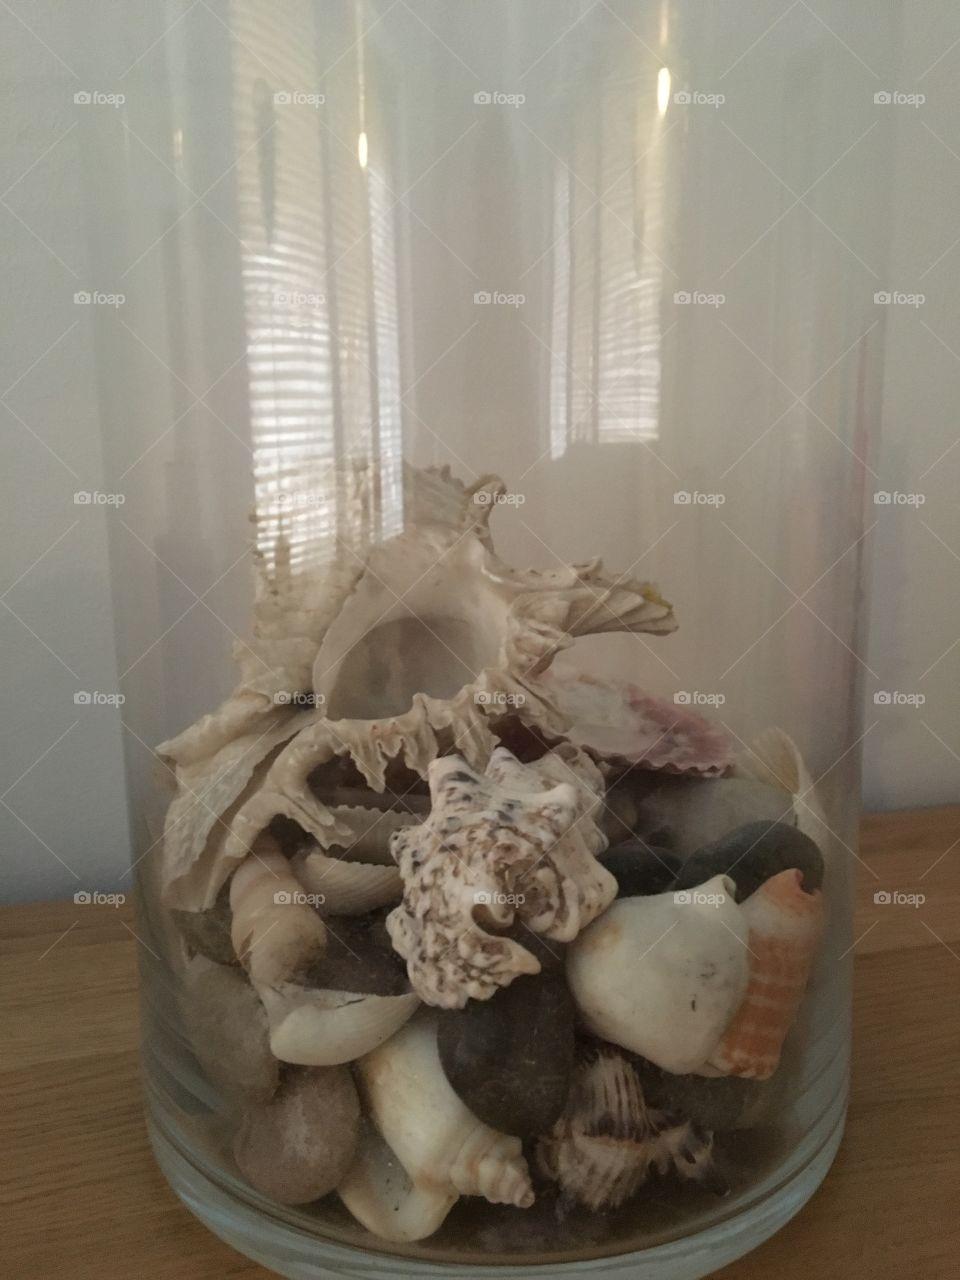 Seashells in glassbowl